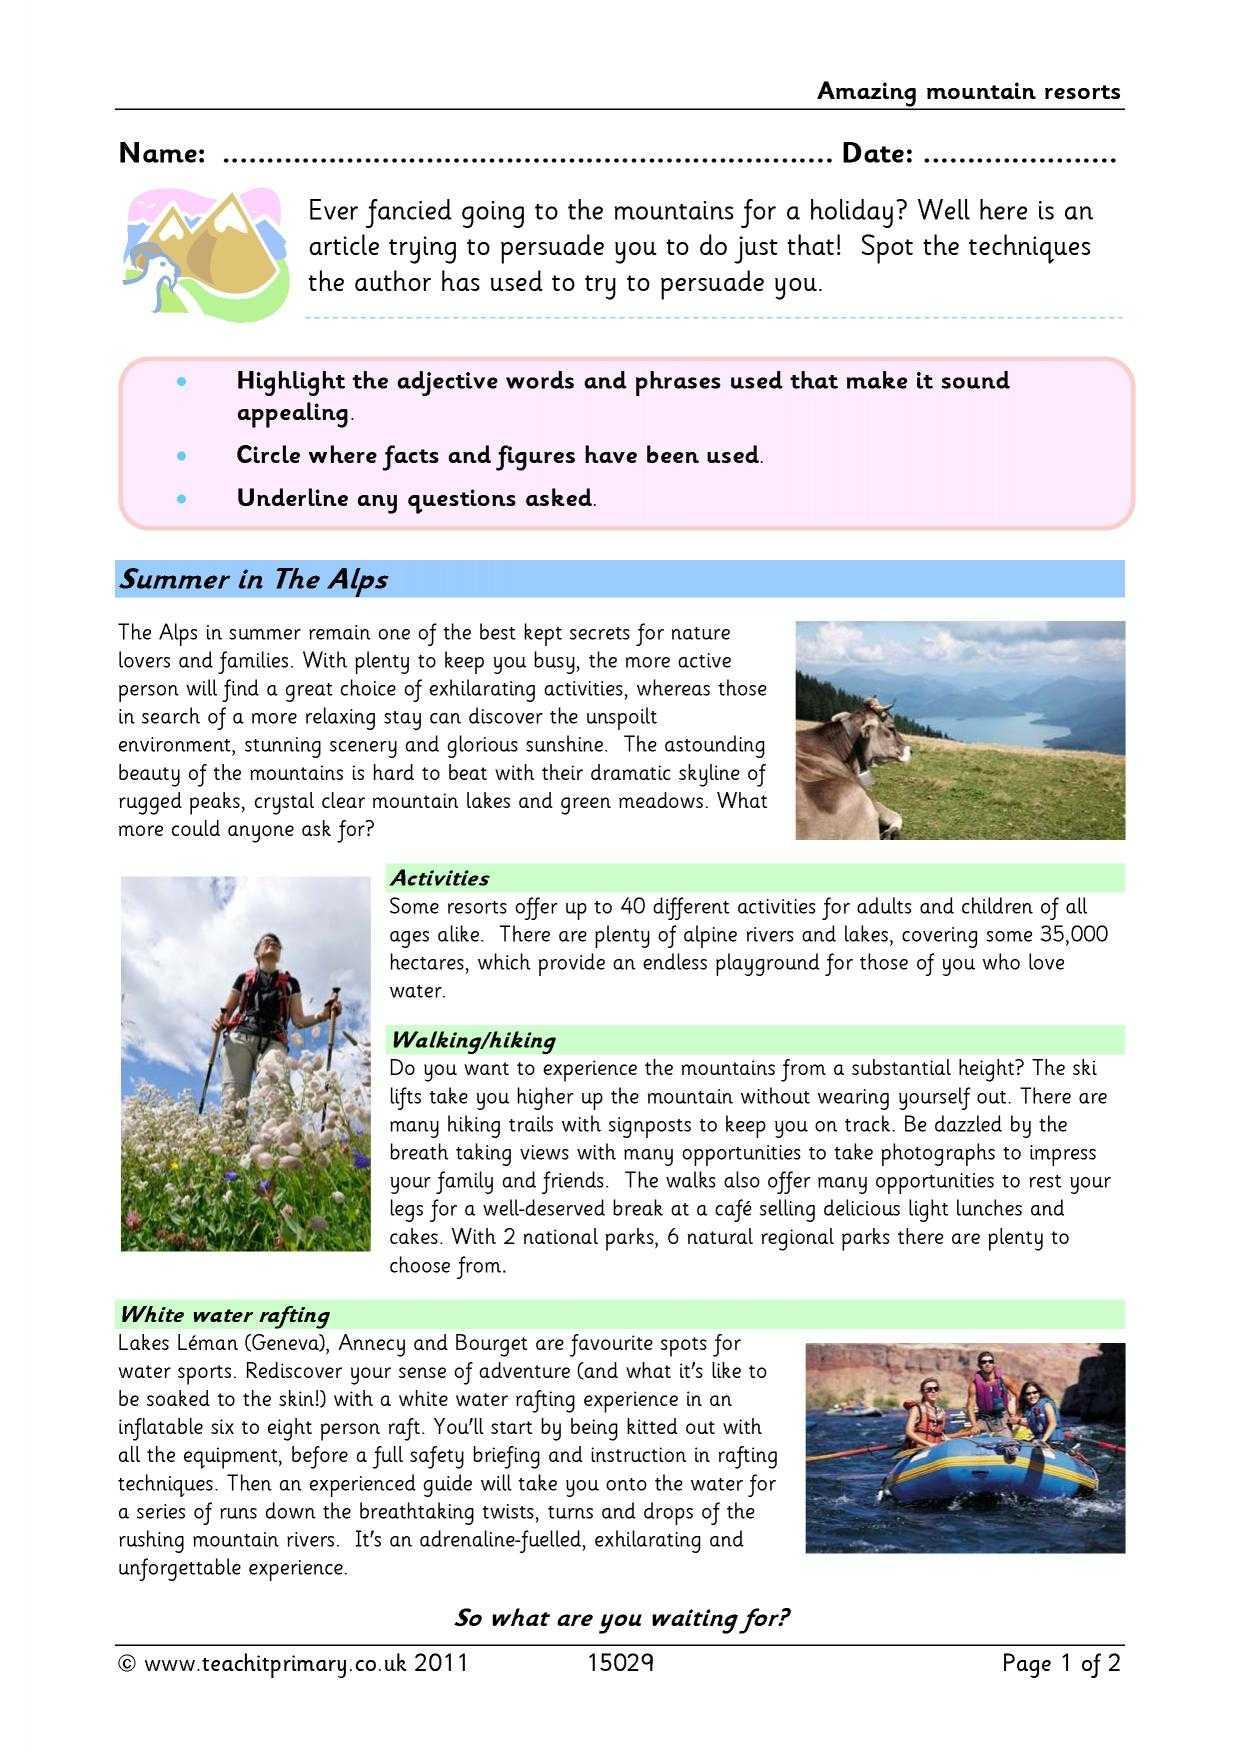 Brochure Writing - Amazing Mountain Resorts Within Travel Brochure Template Ks2